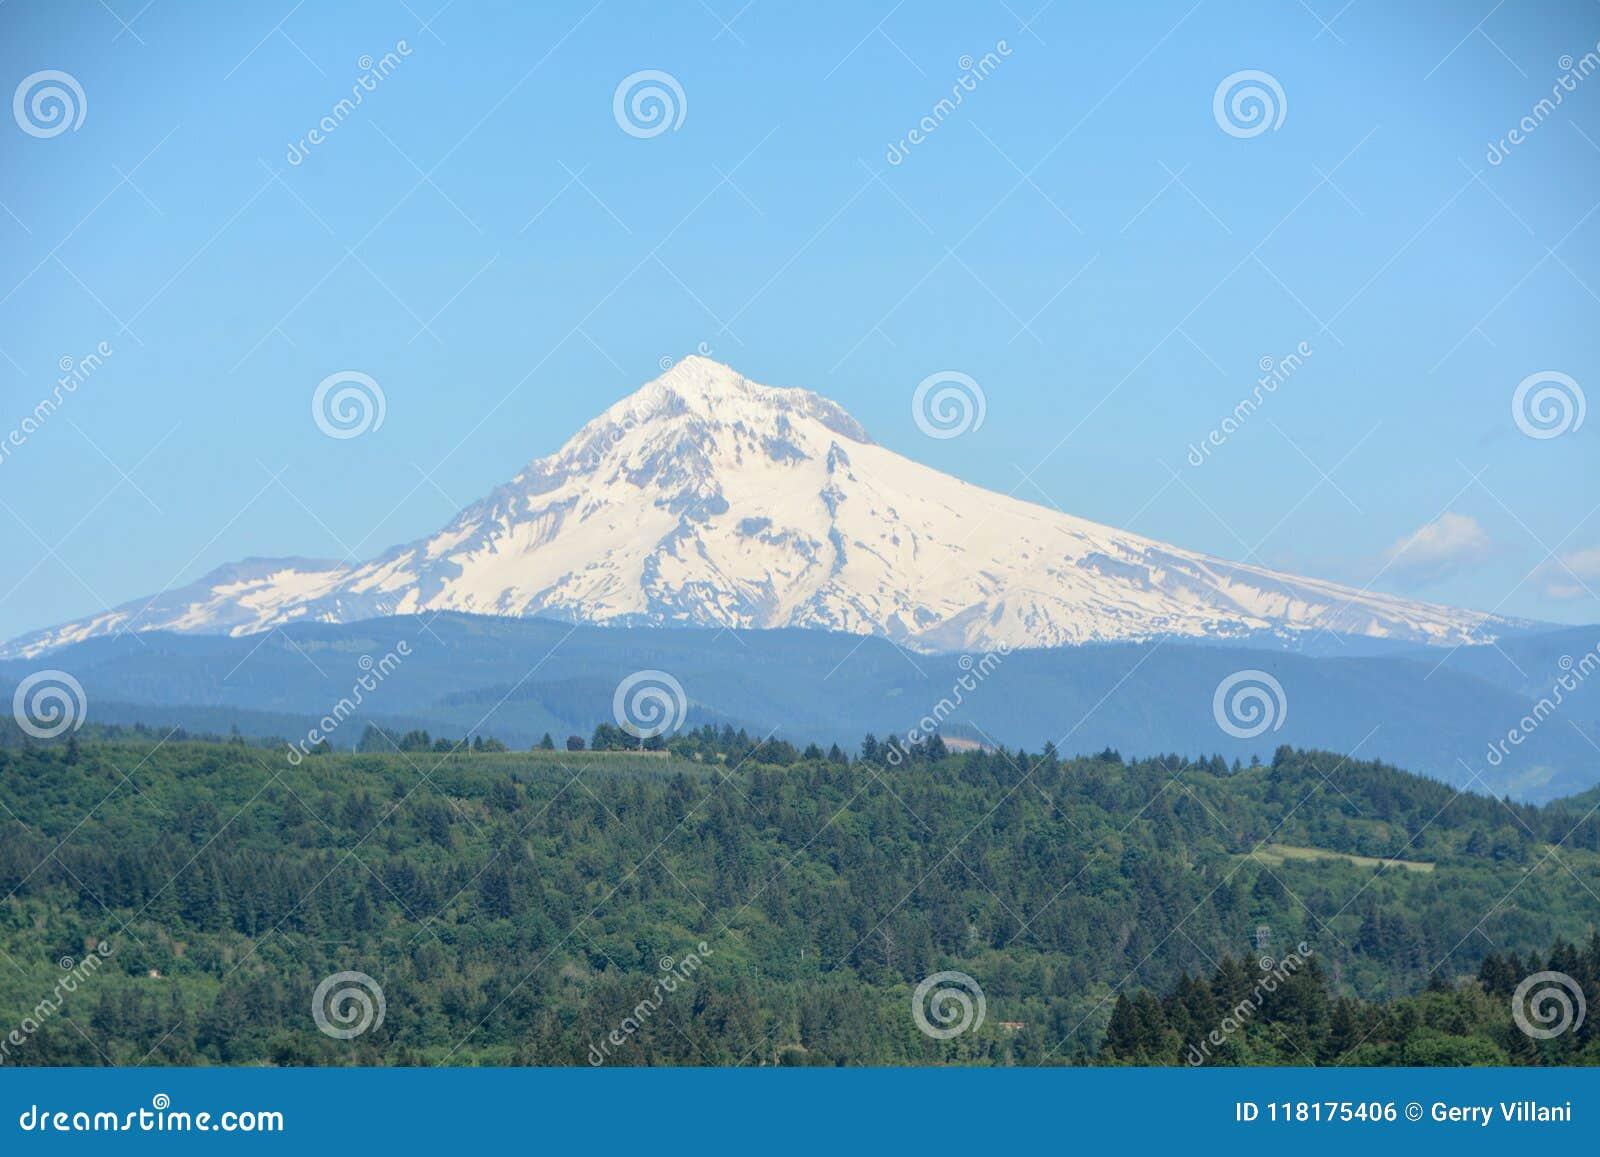 Download Mt. Hood From Jonsrud Point, Oregon Image 2 Stock Photo - Image of green, hood: 118175406